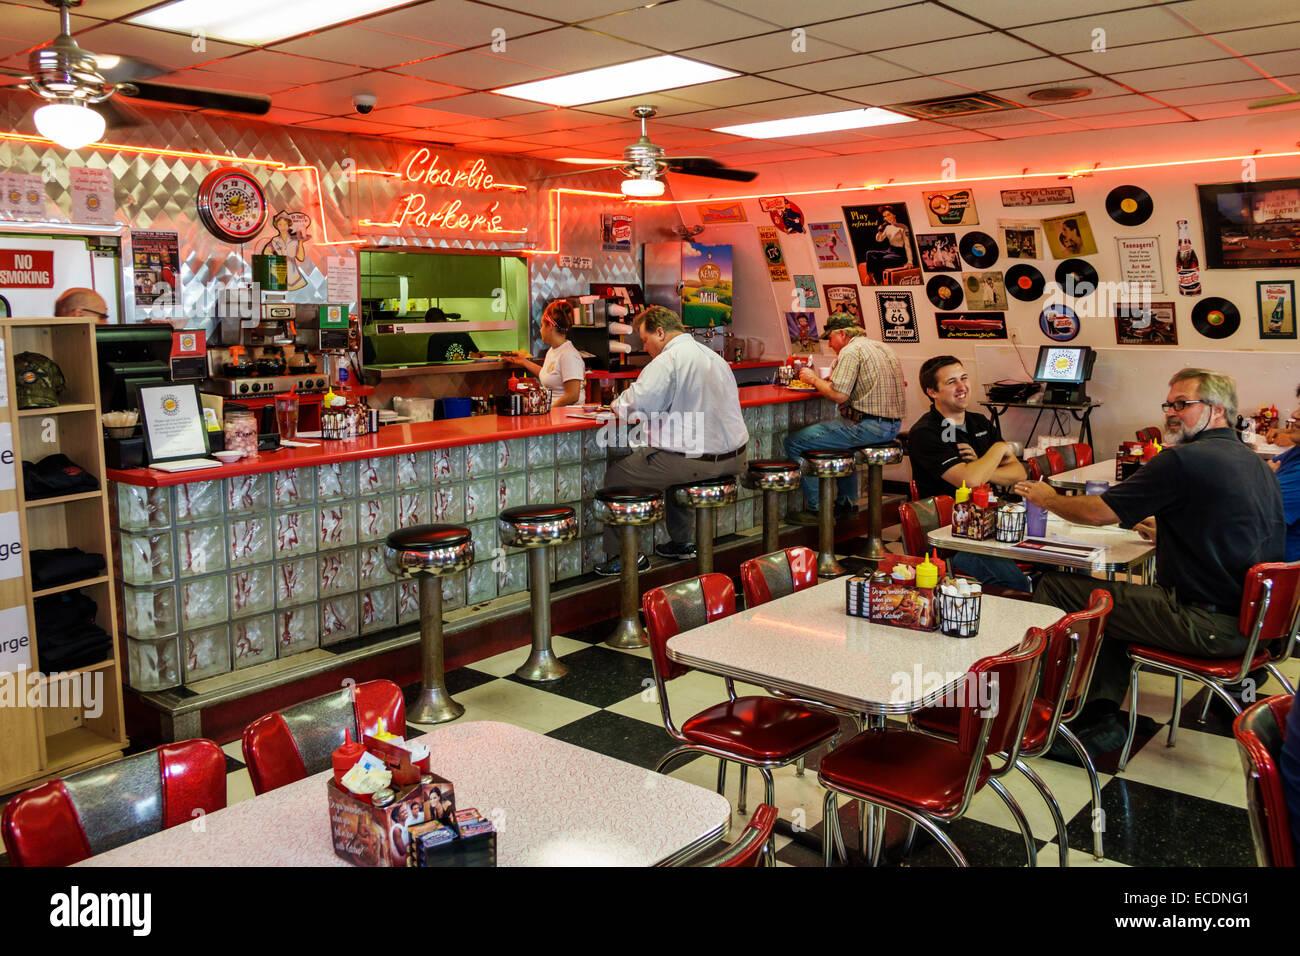 illinois route 66 diner stock photos & illinois route 66 diner stock